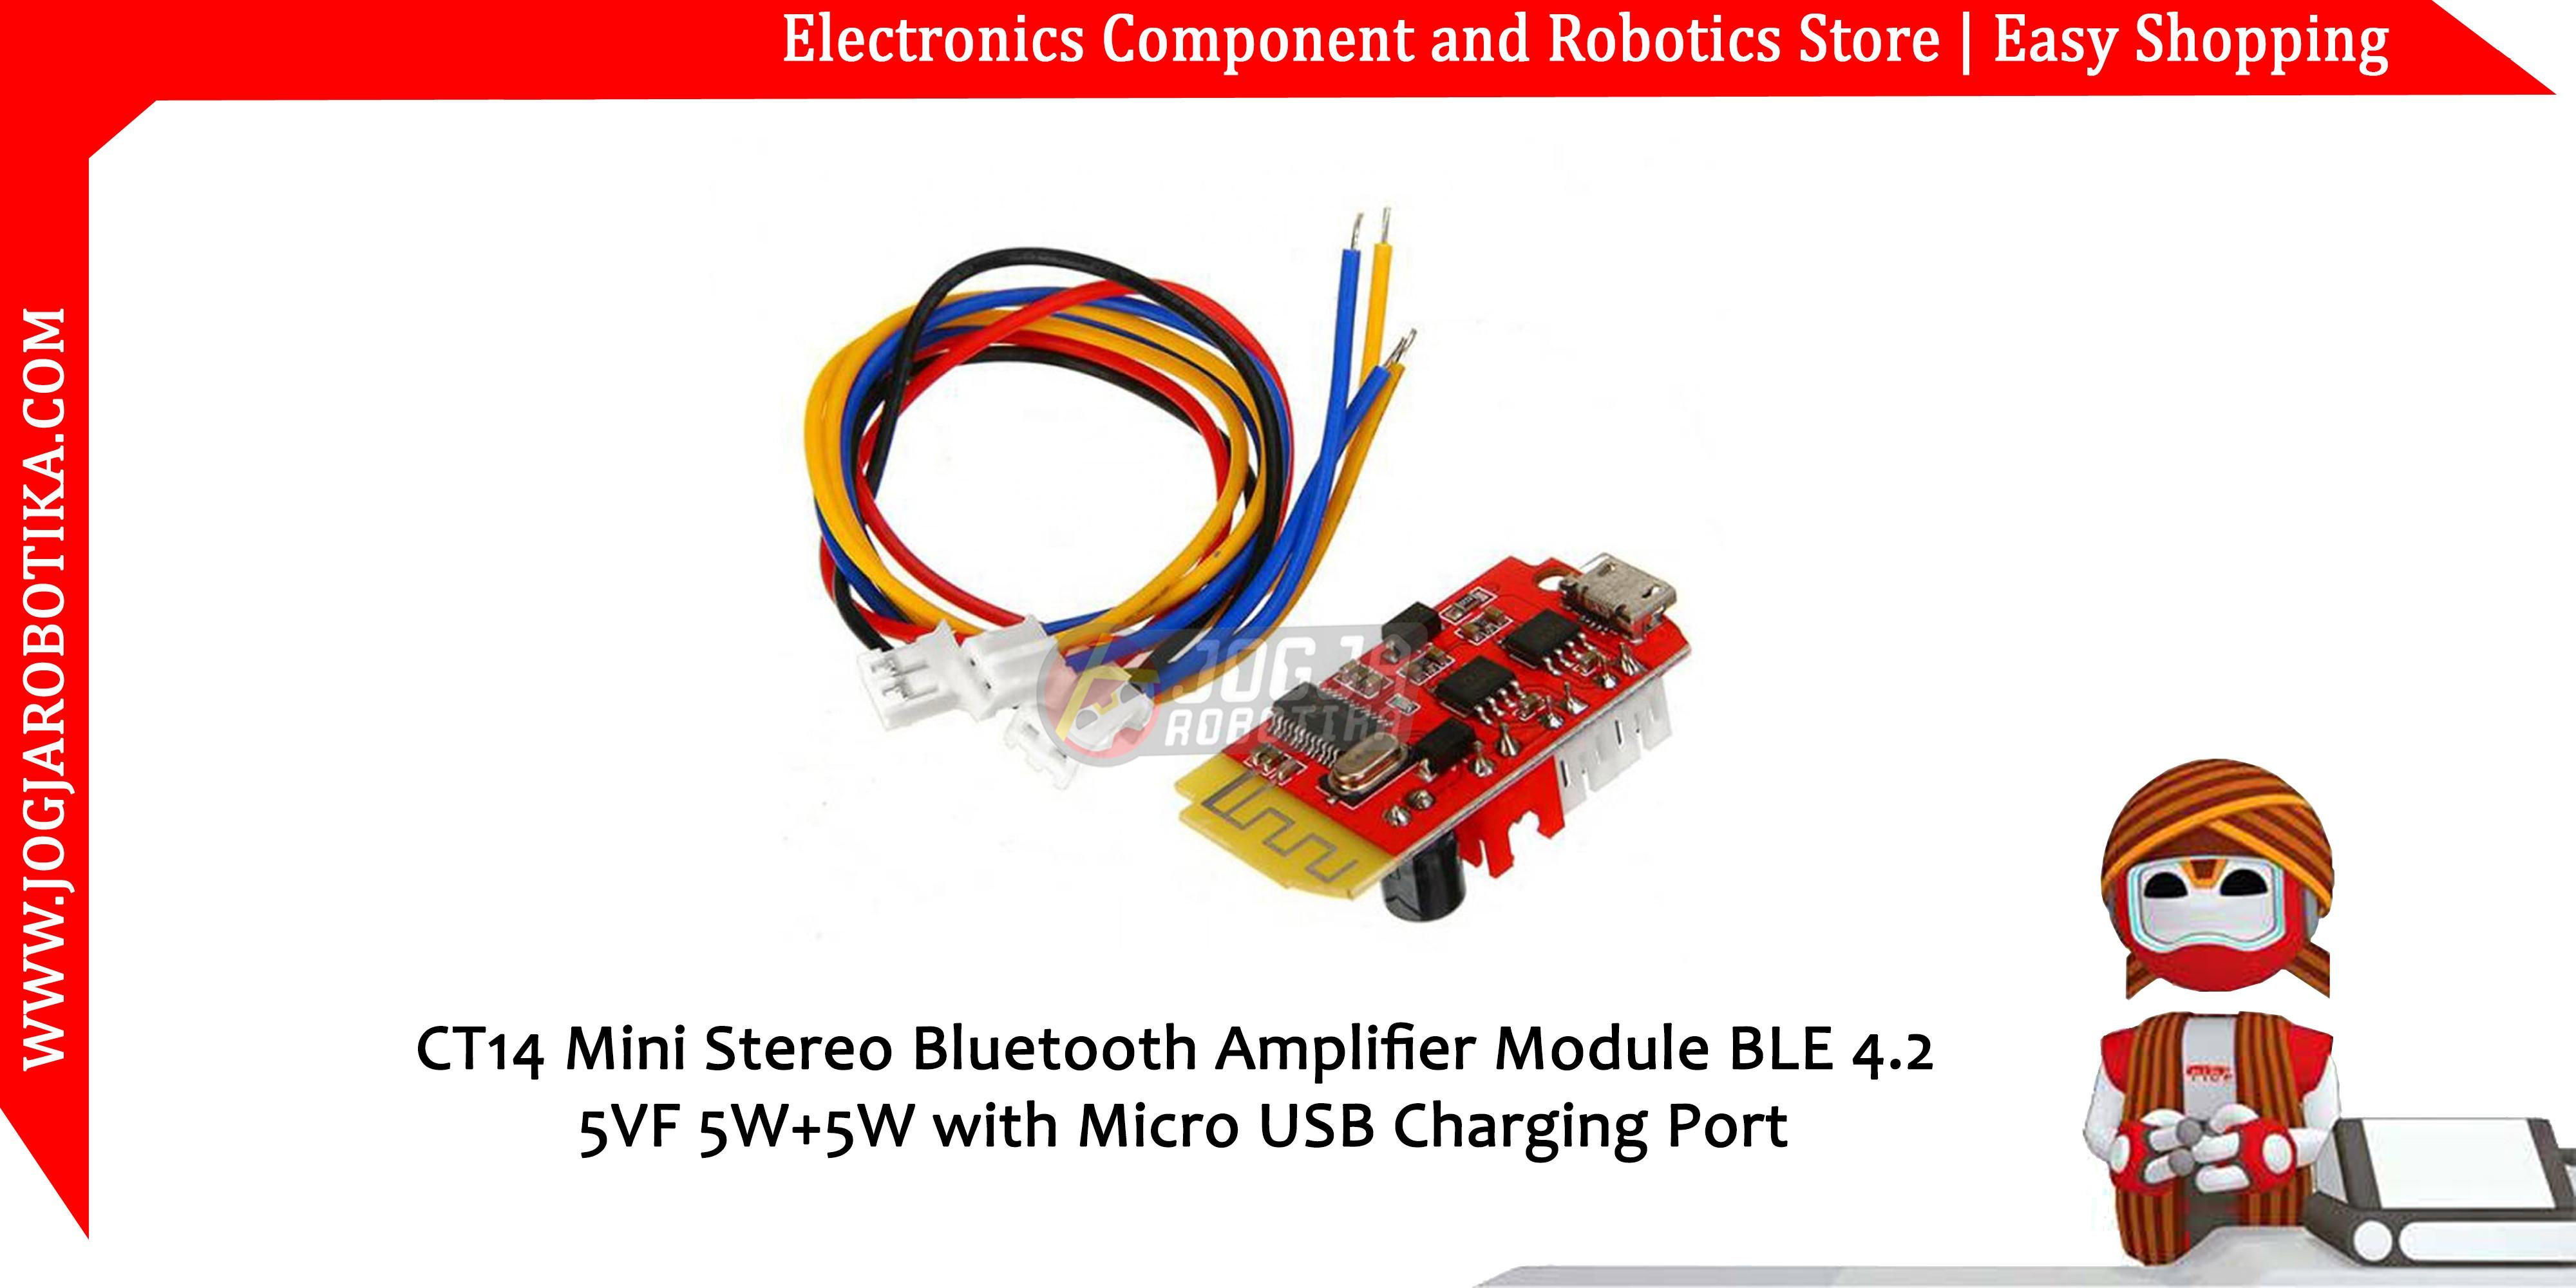 CT14 Mini Stereo Bluetooth 4.2 Power Amplifier Board Module 5VF 5W+5W USB Port